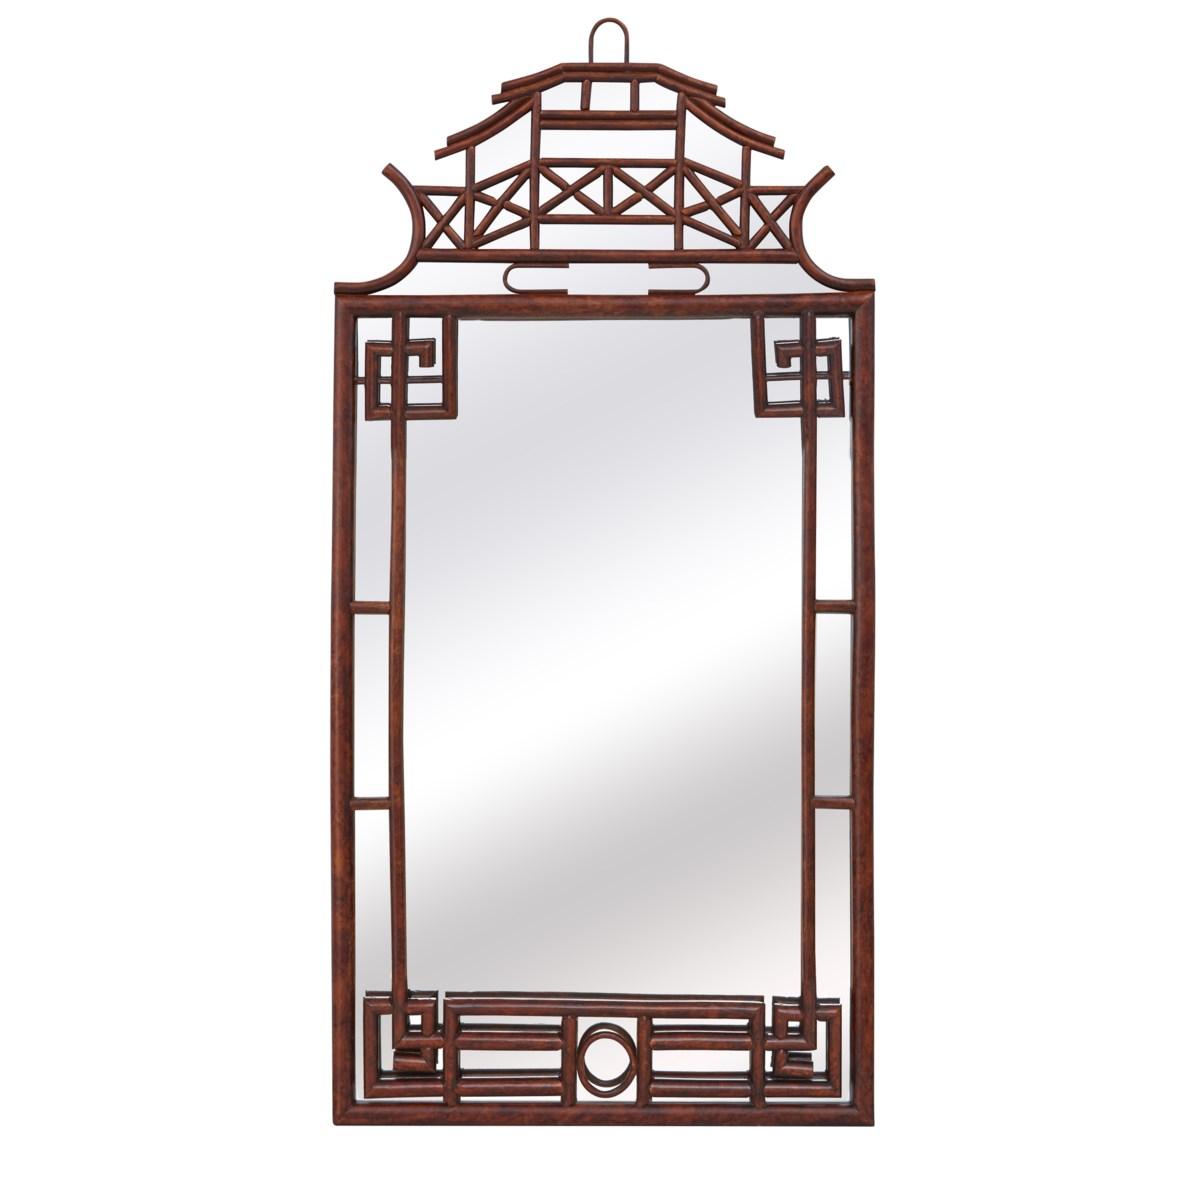 Pagoda Mirror Large Frame Material - Rattan Frame Color - Tortoise